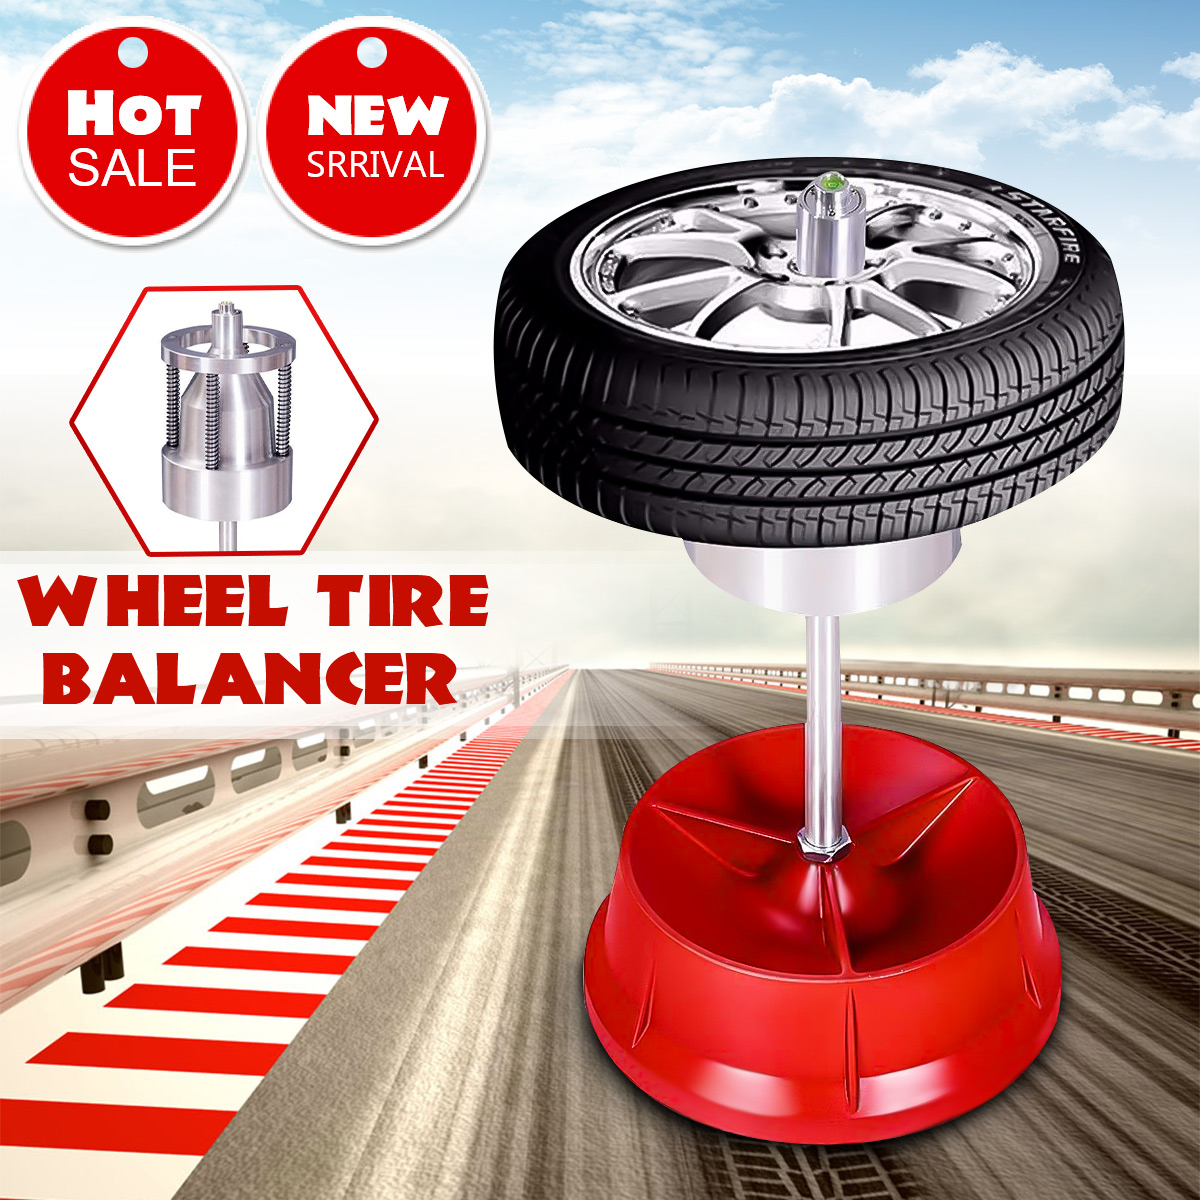 Car Truck Portable Hubs Wheel Tire Balancer Bubble Level Heavy Duty Rim Car Tire Wheel Balancer Auto Tyre Balancing Machine